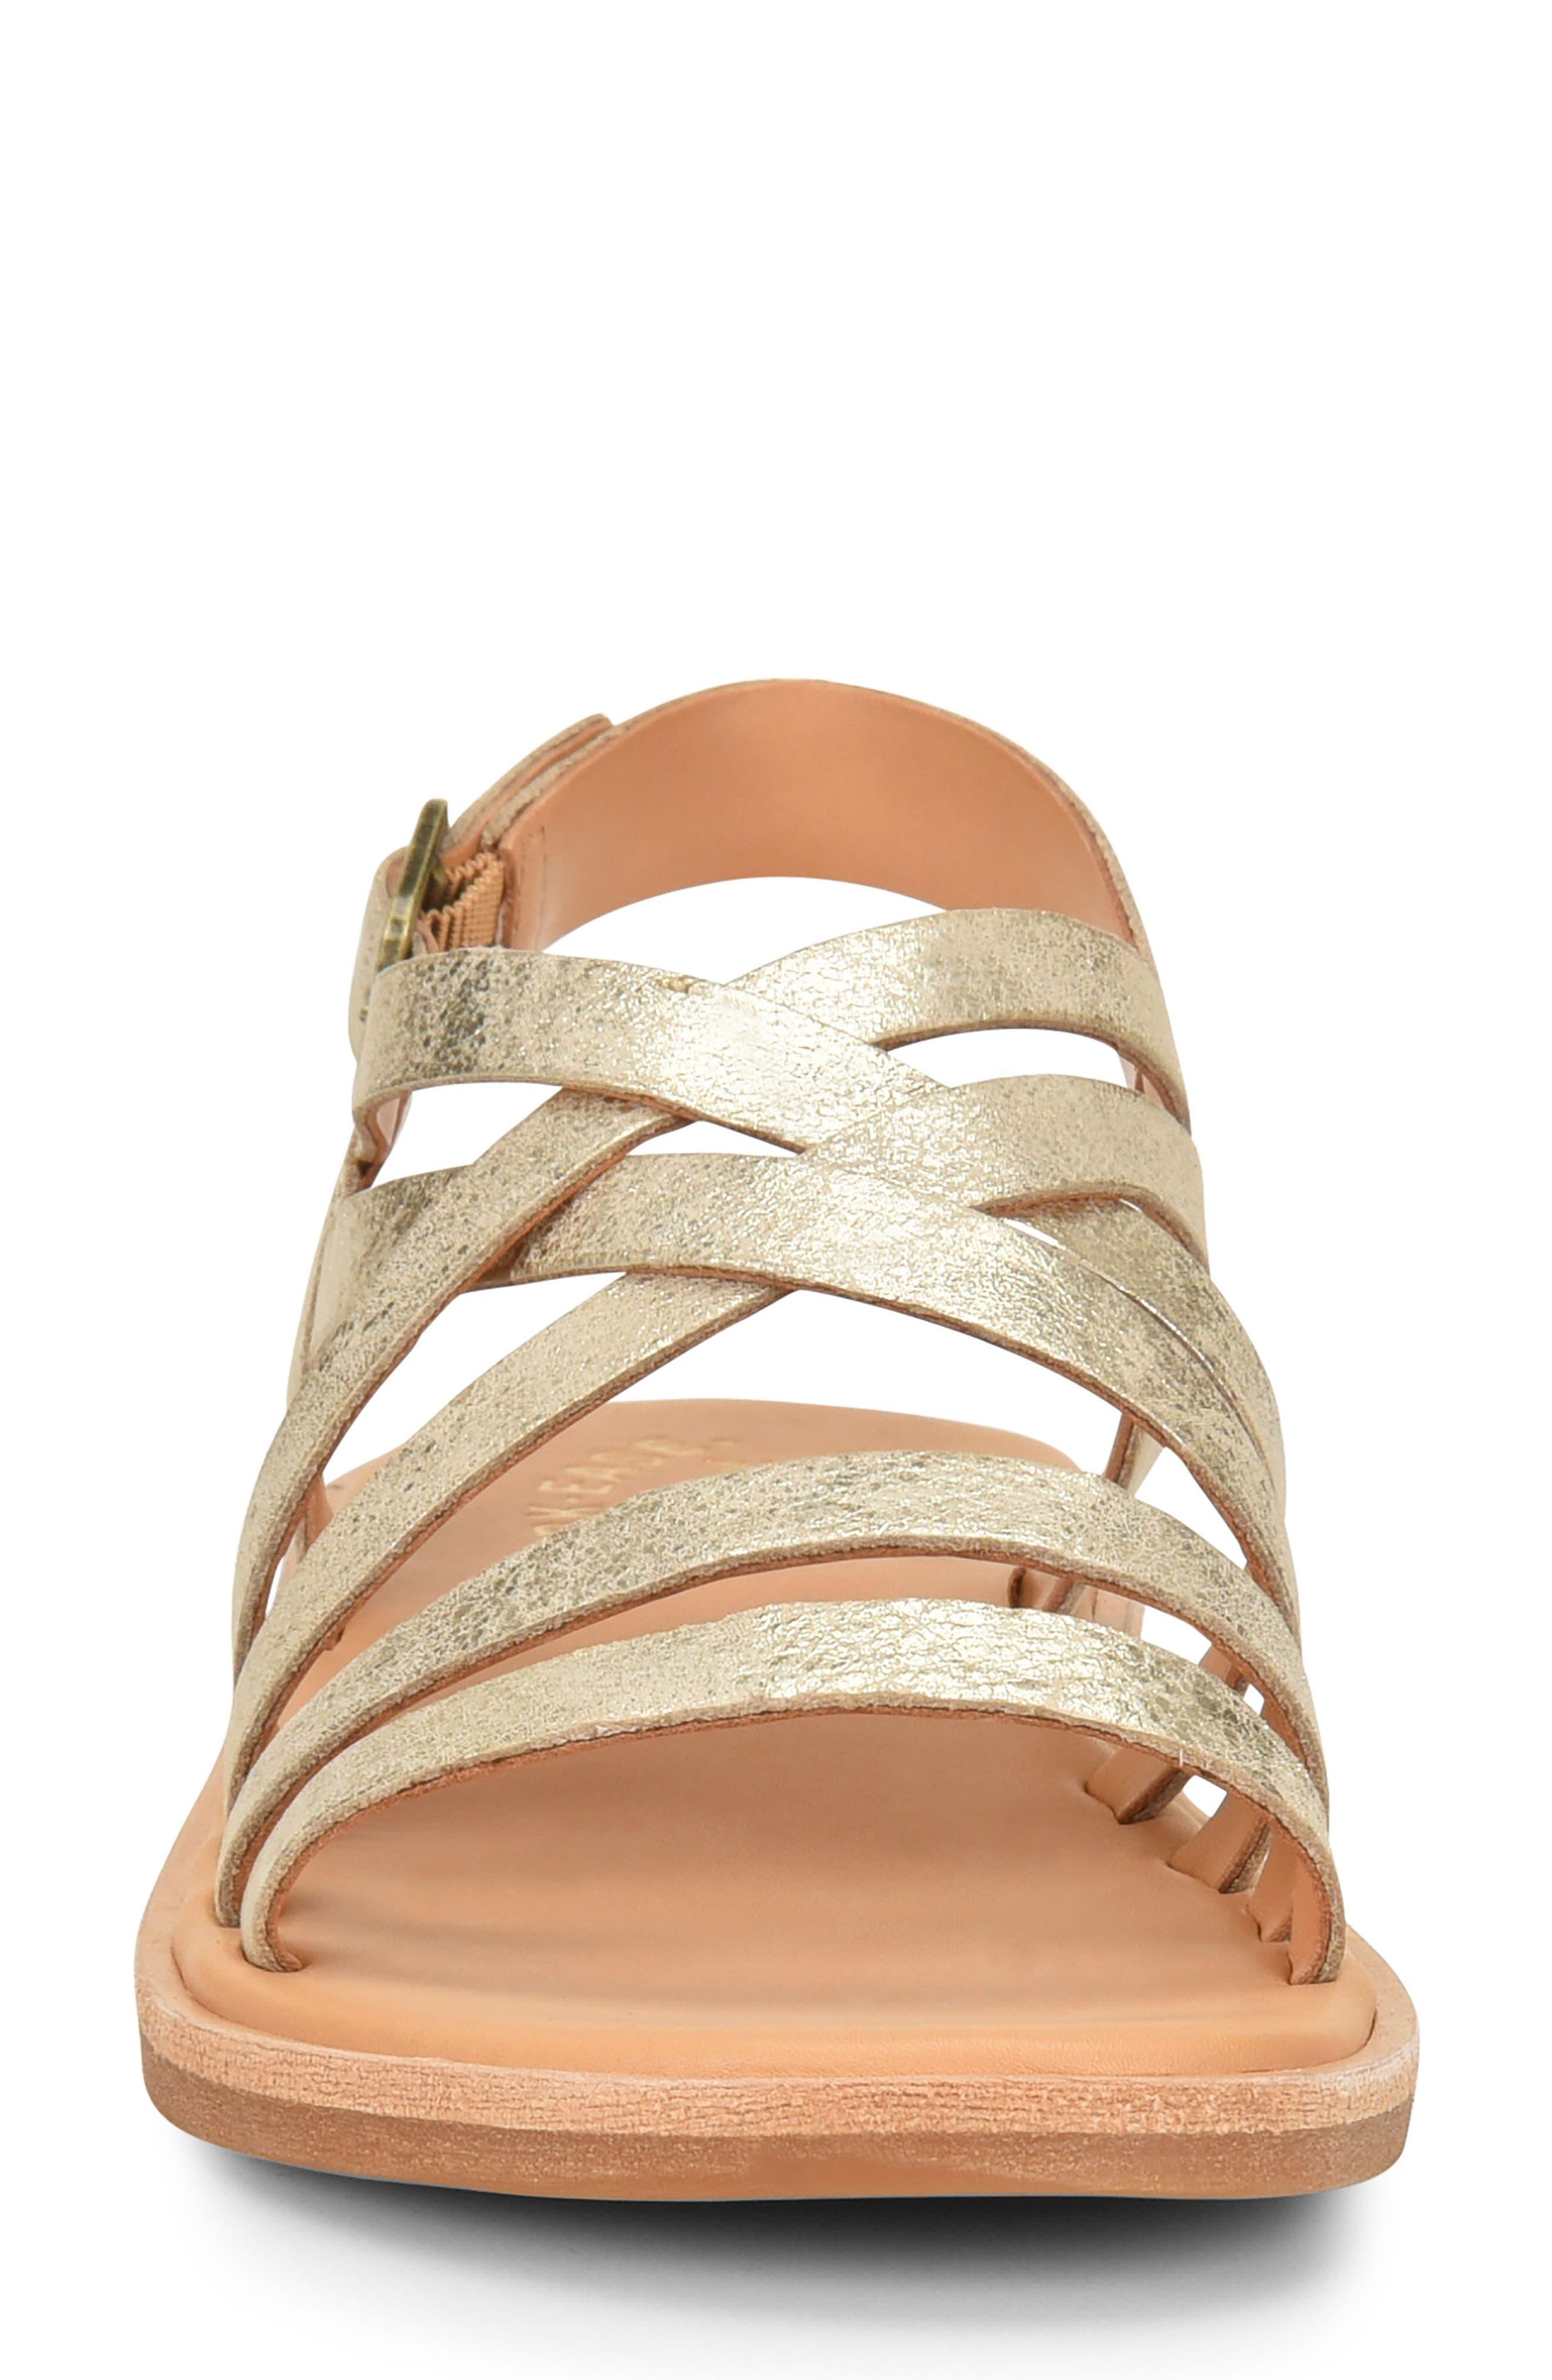 Nicobar Sandal,                             Alternate thumbnail 4, color,                             Gold Metallic Leather